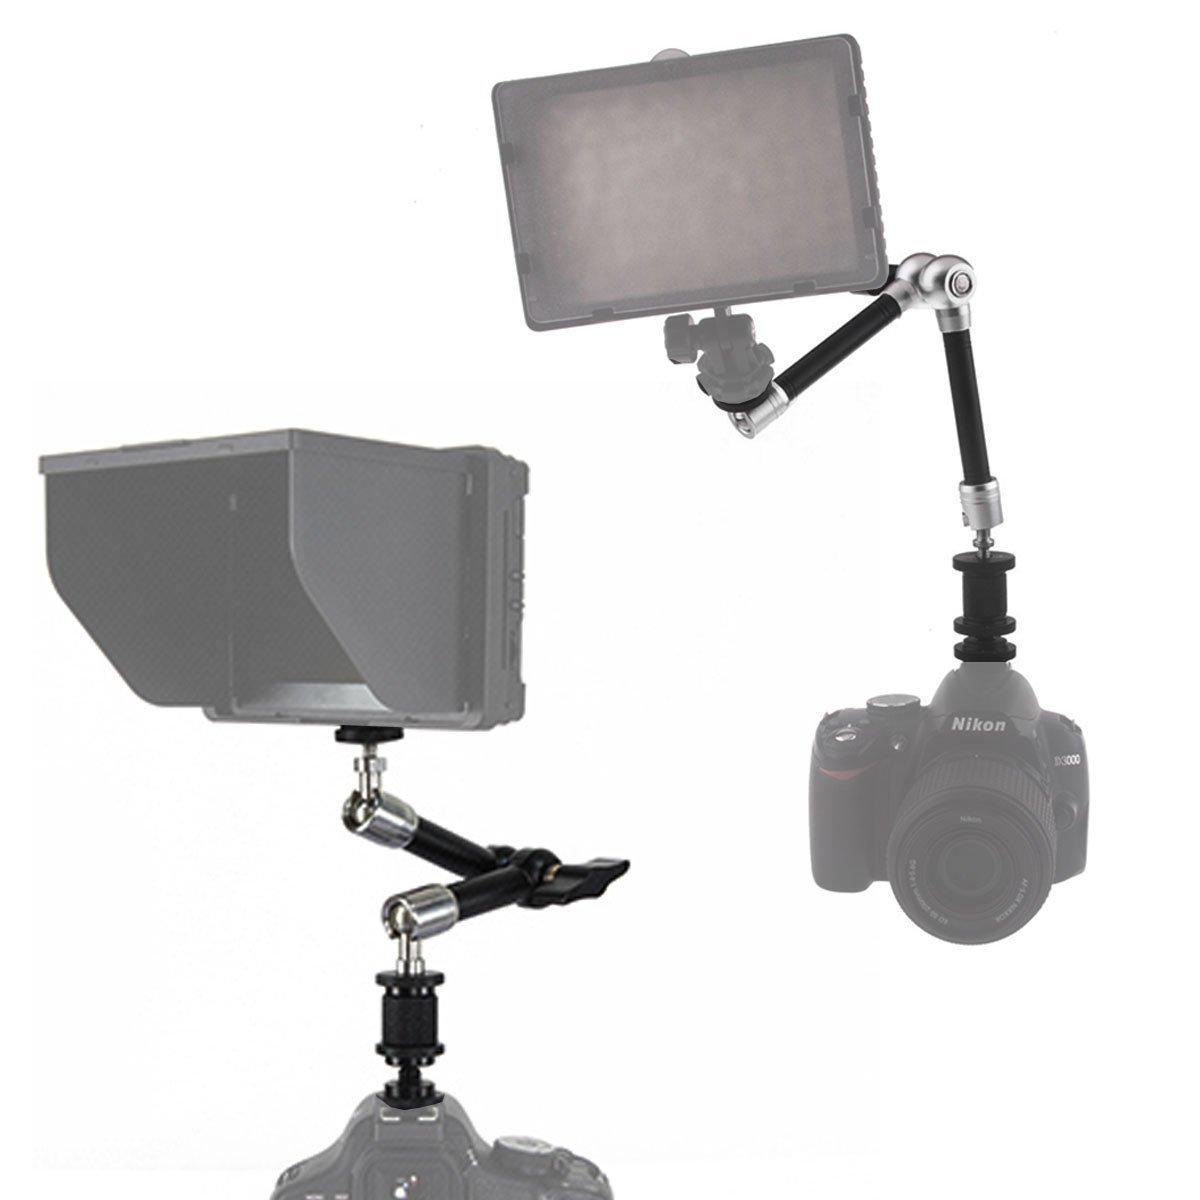 Magic Arm, CAM-ULATA 7 Zoll Einstellbar Reibung Articulating Magic Arm für Hot Shoe Mount DSLR Kamera Rig LCD DV Monitor / LED Leuchtet Taschenlampe Dolly Auto, Silber, 18cm / 7 \